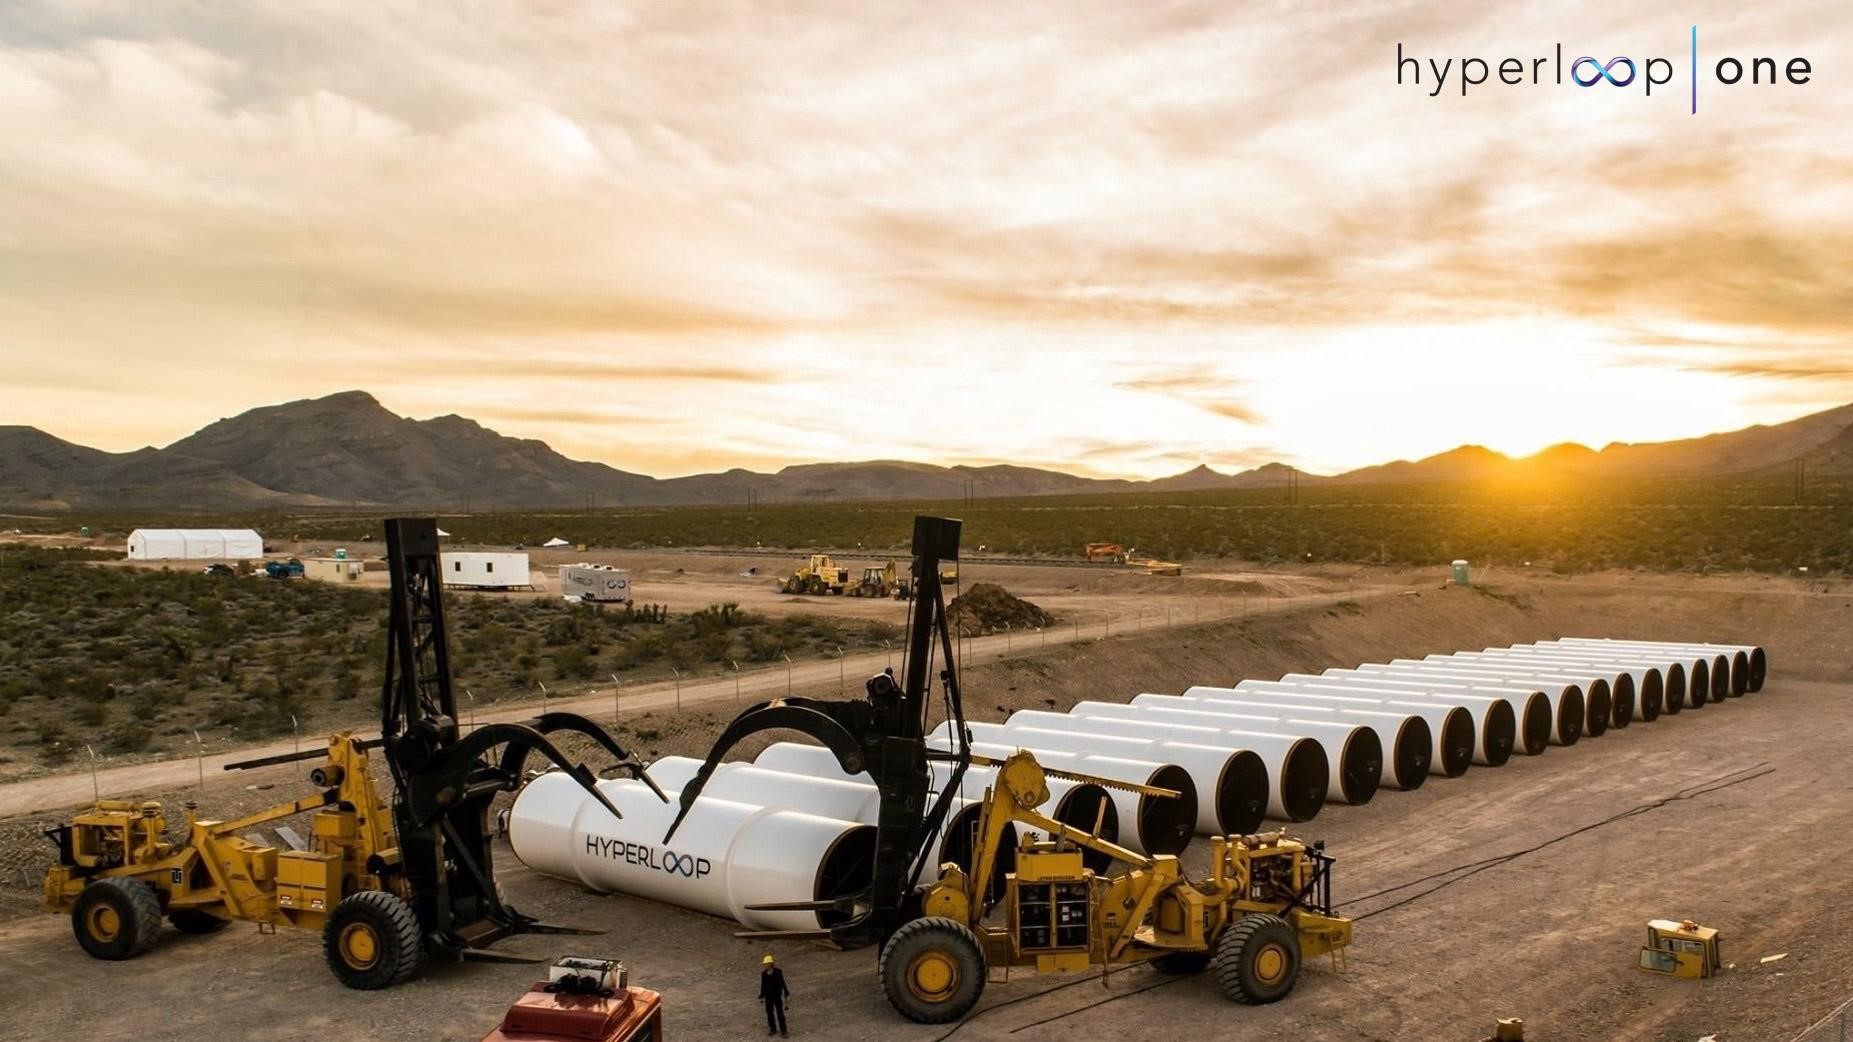 Hyperloop tubes await future test runs